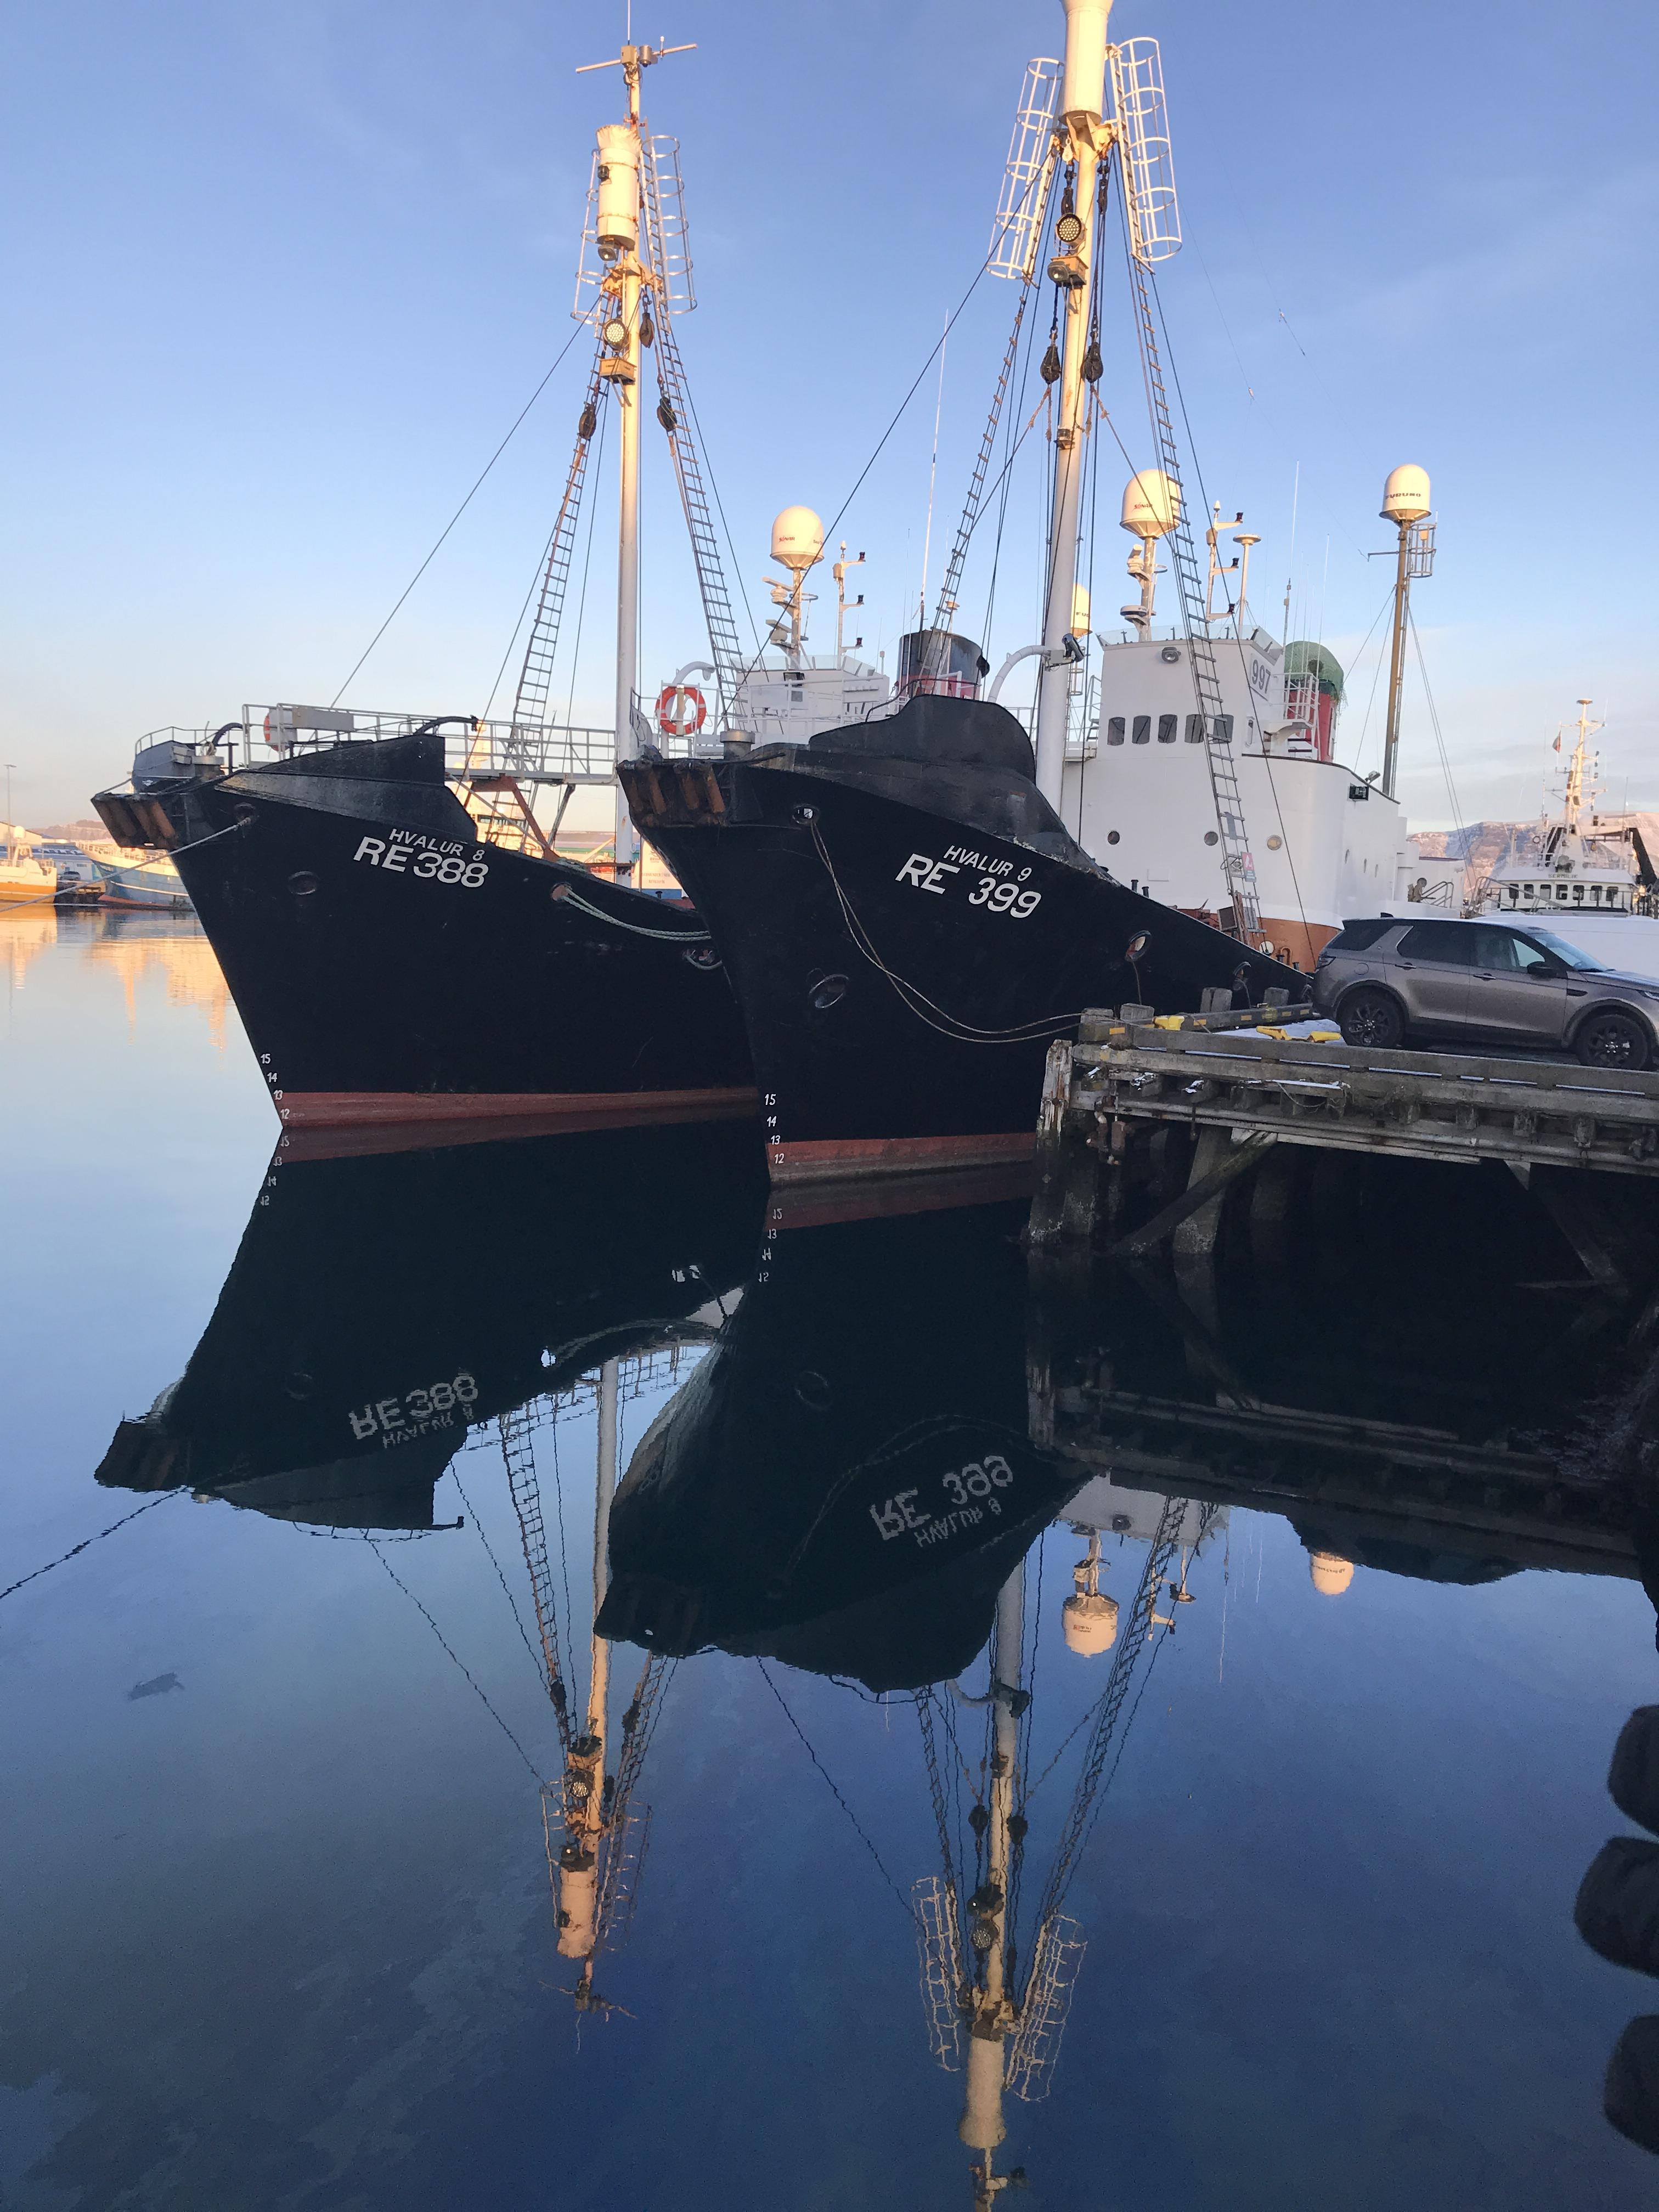 Reykjavik Iceland boats